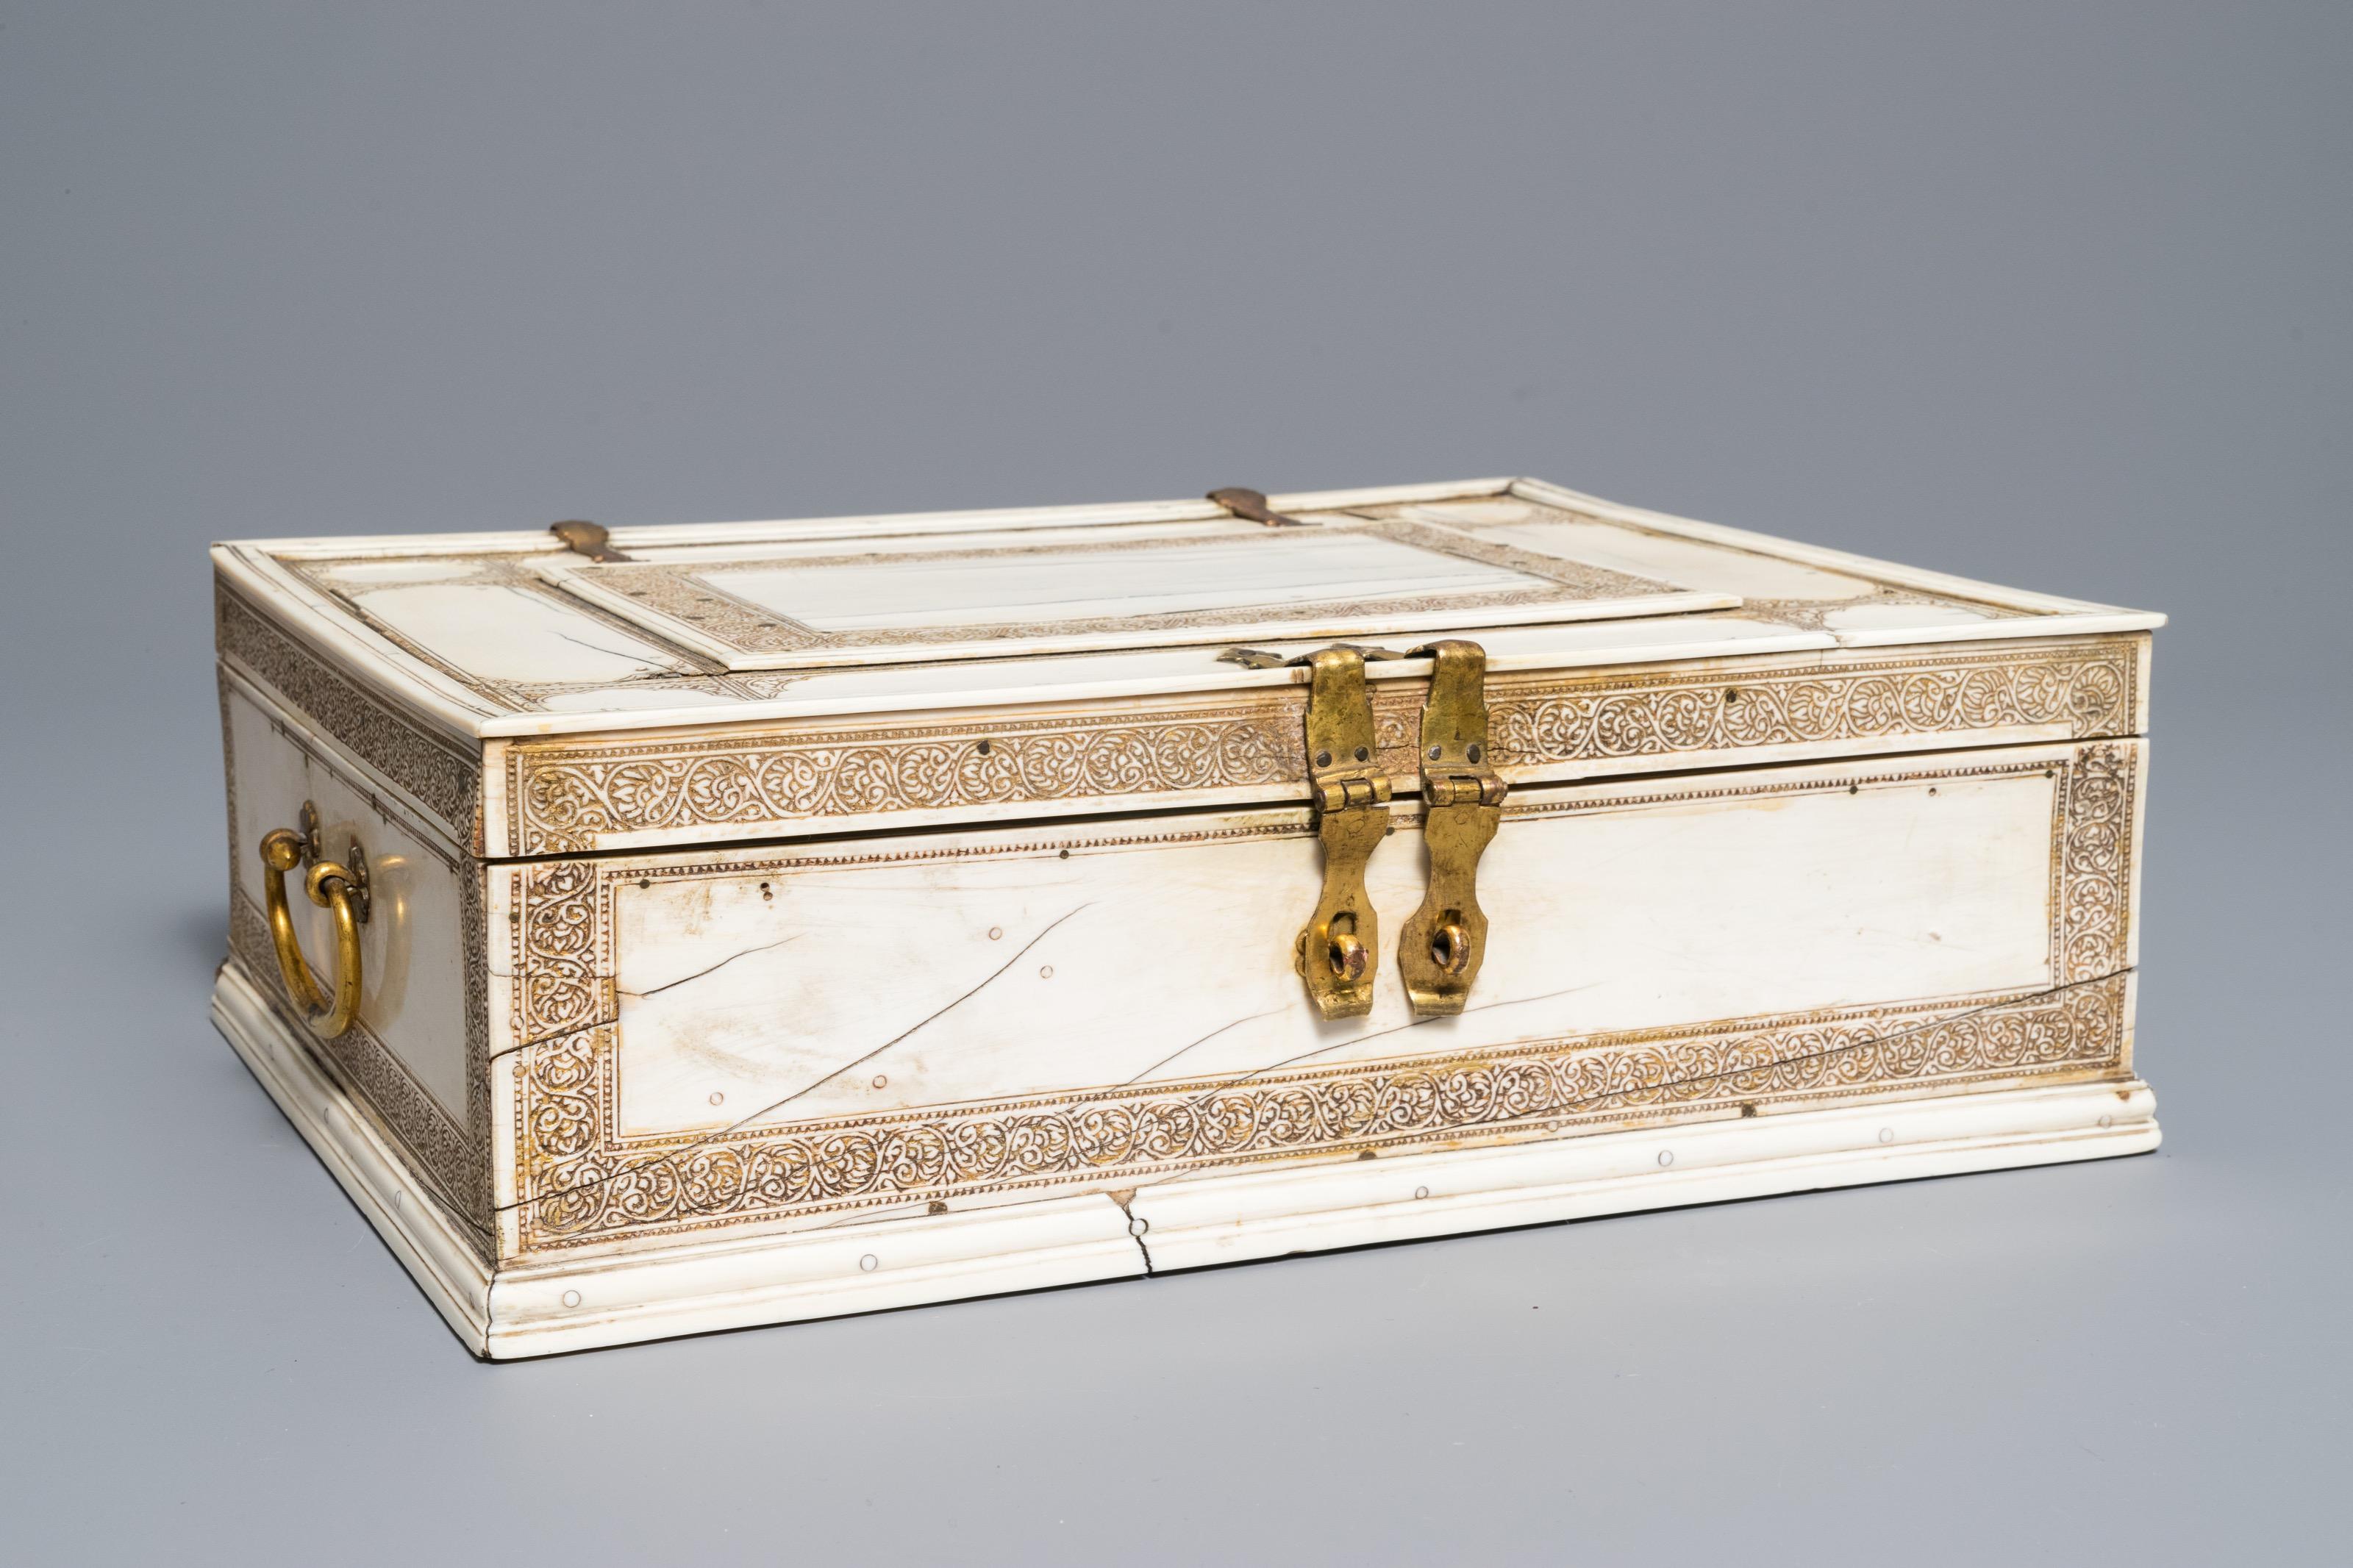 a-rectangular-siculo-arabic-ivory-casket-sicily-1314th-c-1.jpg